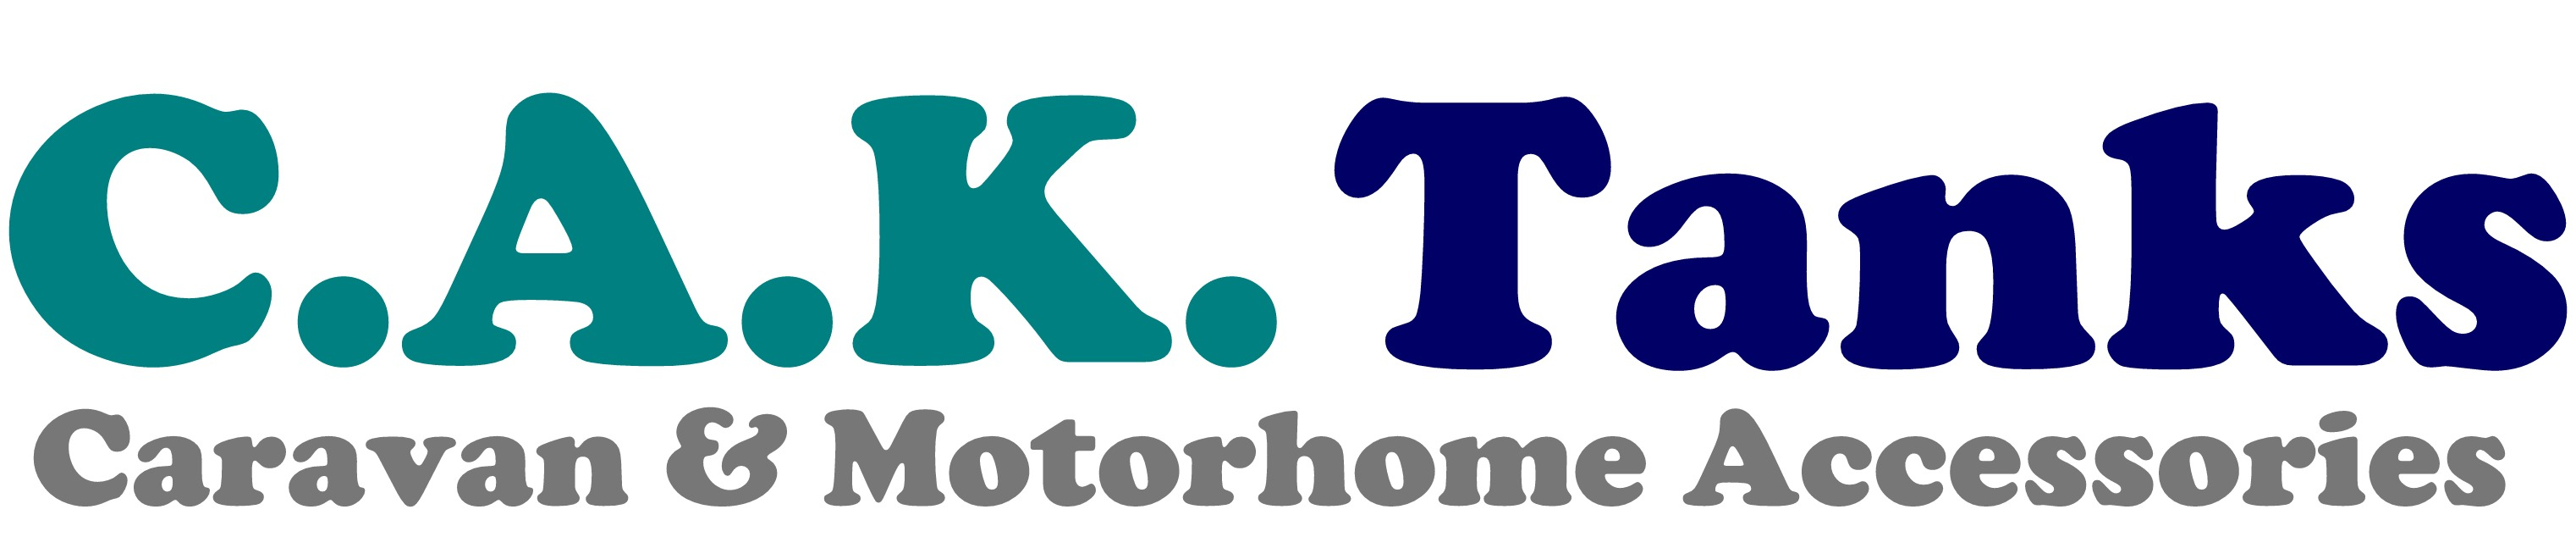 Motorhome Accessories Caravan Accessories Spare Parts